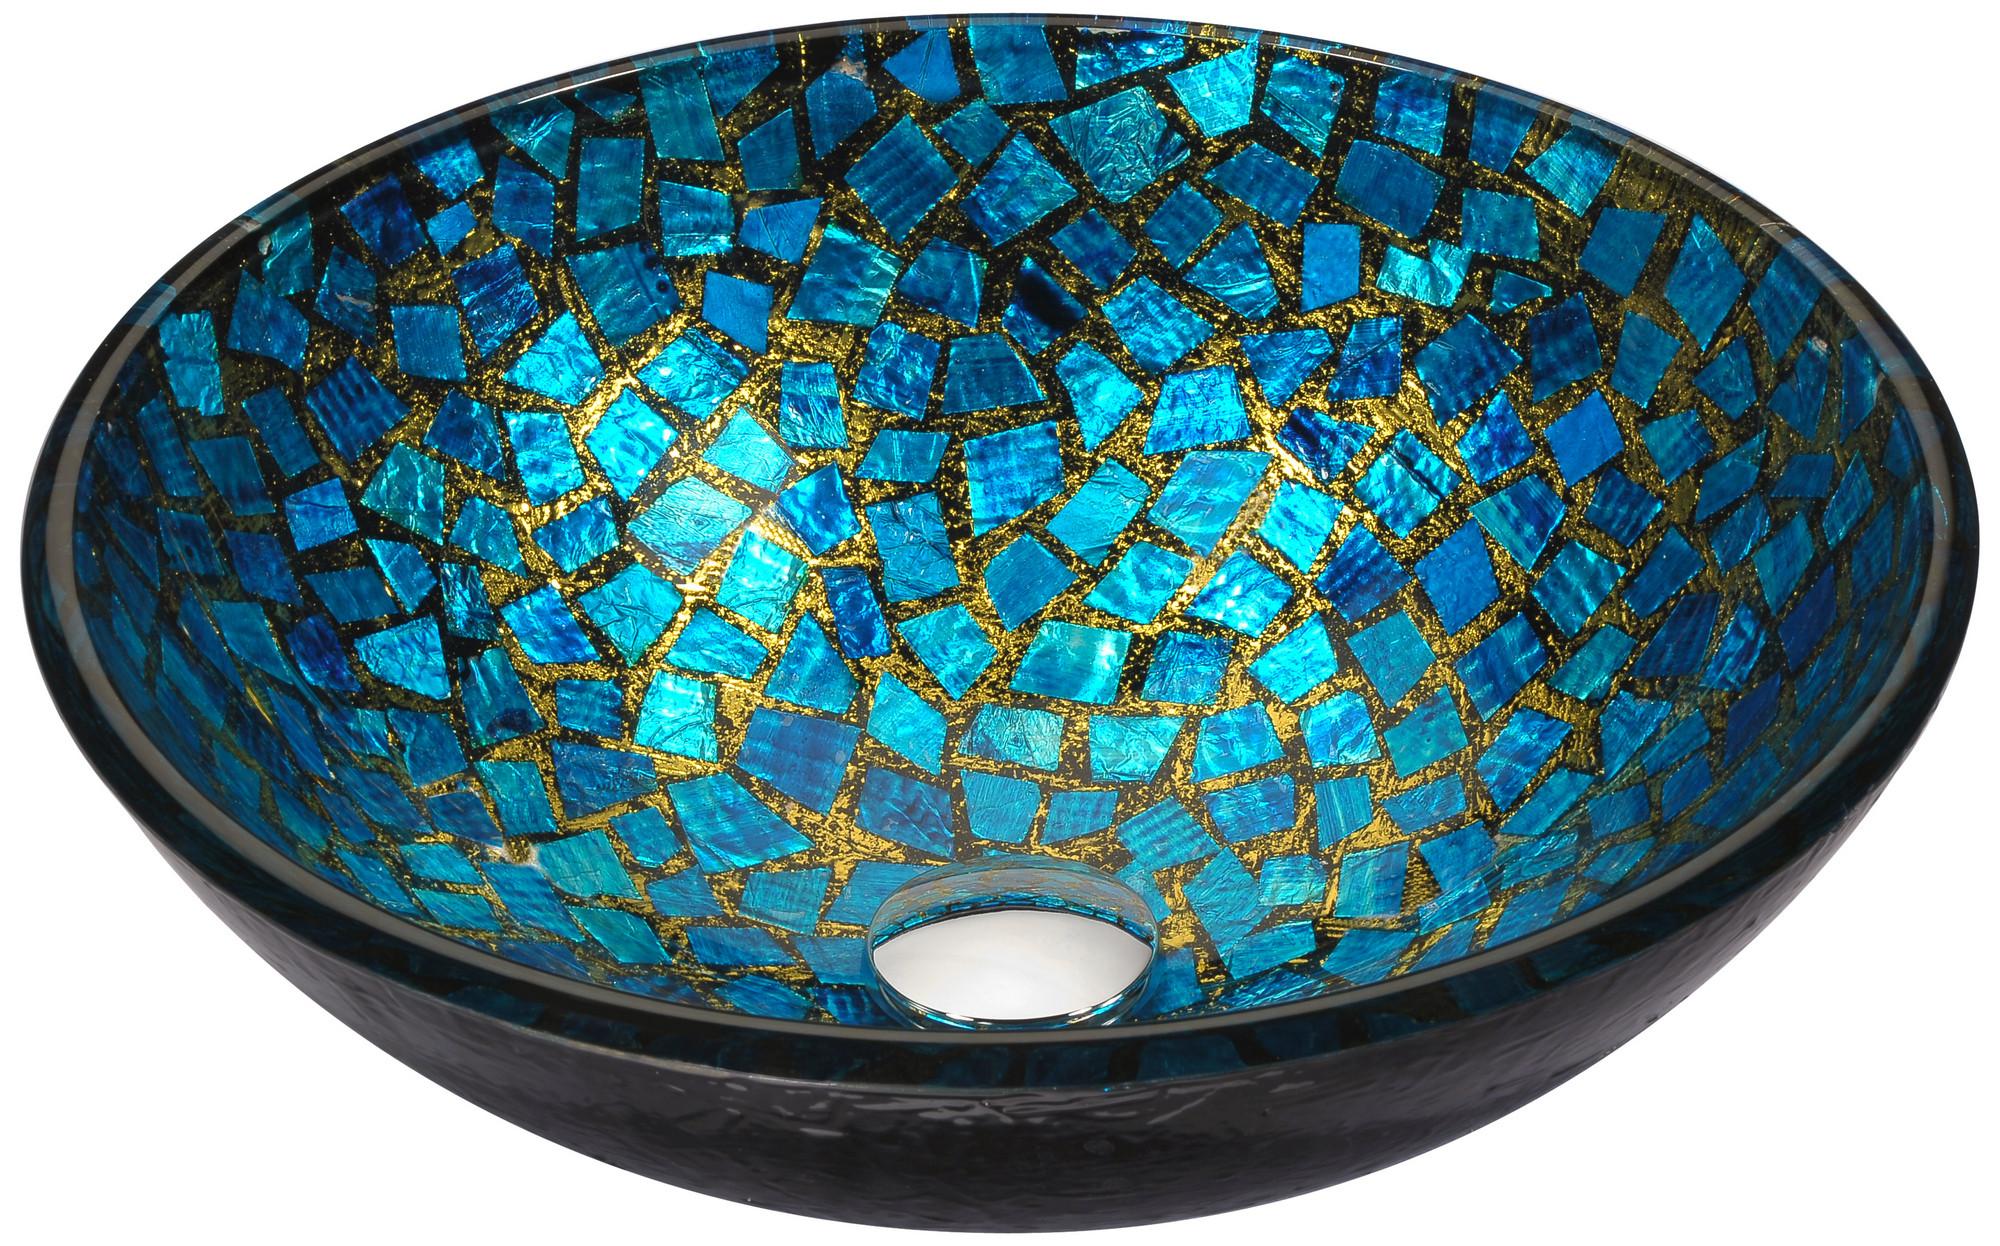 ANZZI LS-AZ198 Mosaic Series Deco-Glass Vessel Sink In Blue/Gold Mosaic